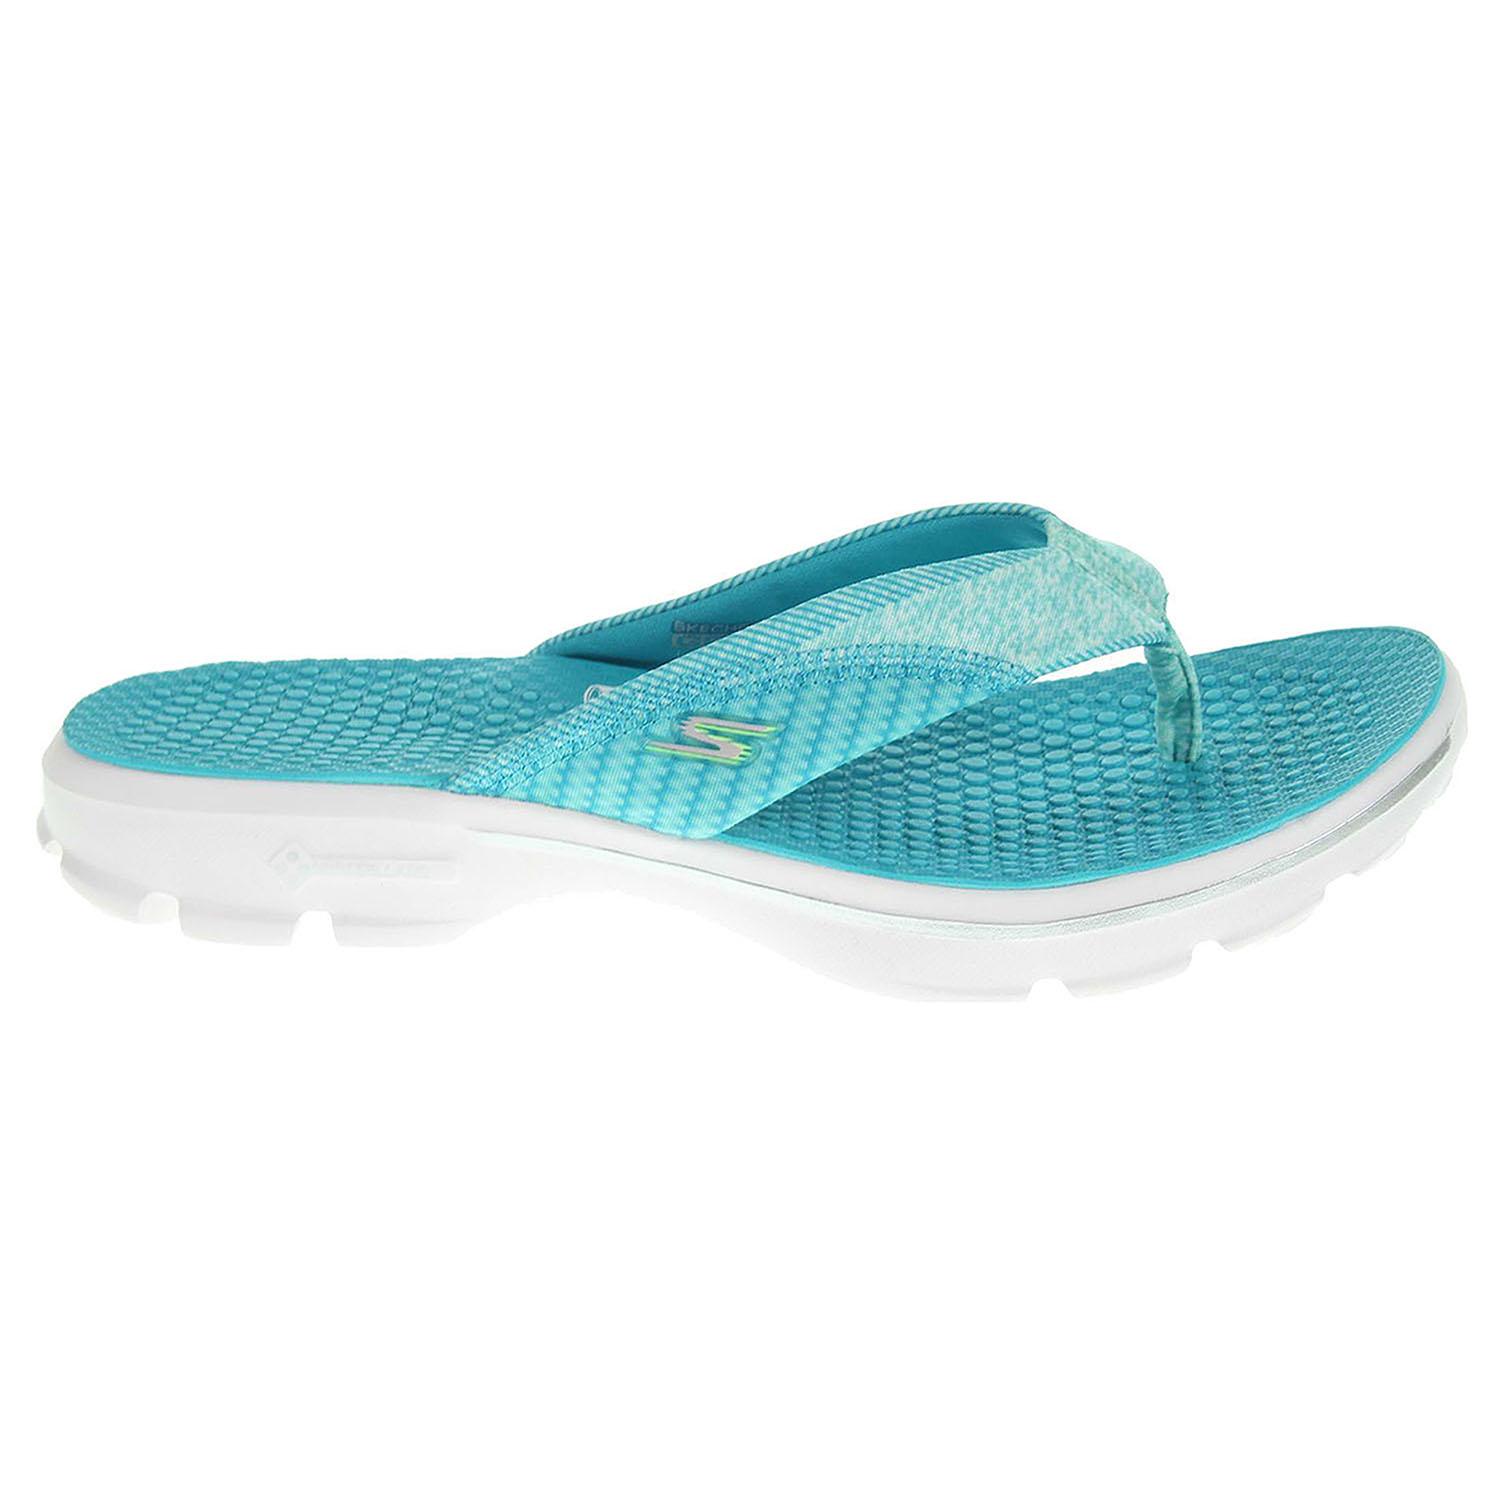 Skechers Go Walk-Pizazz turquoise 37